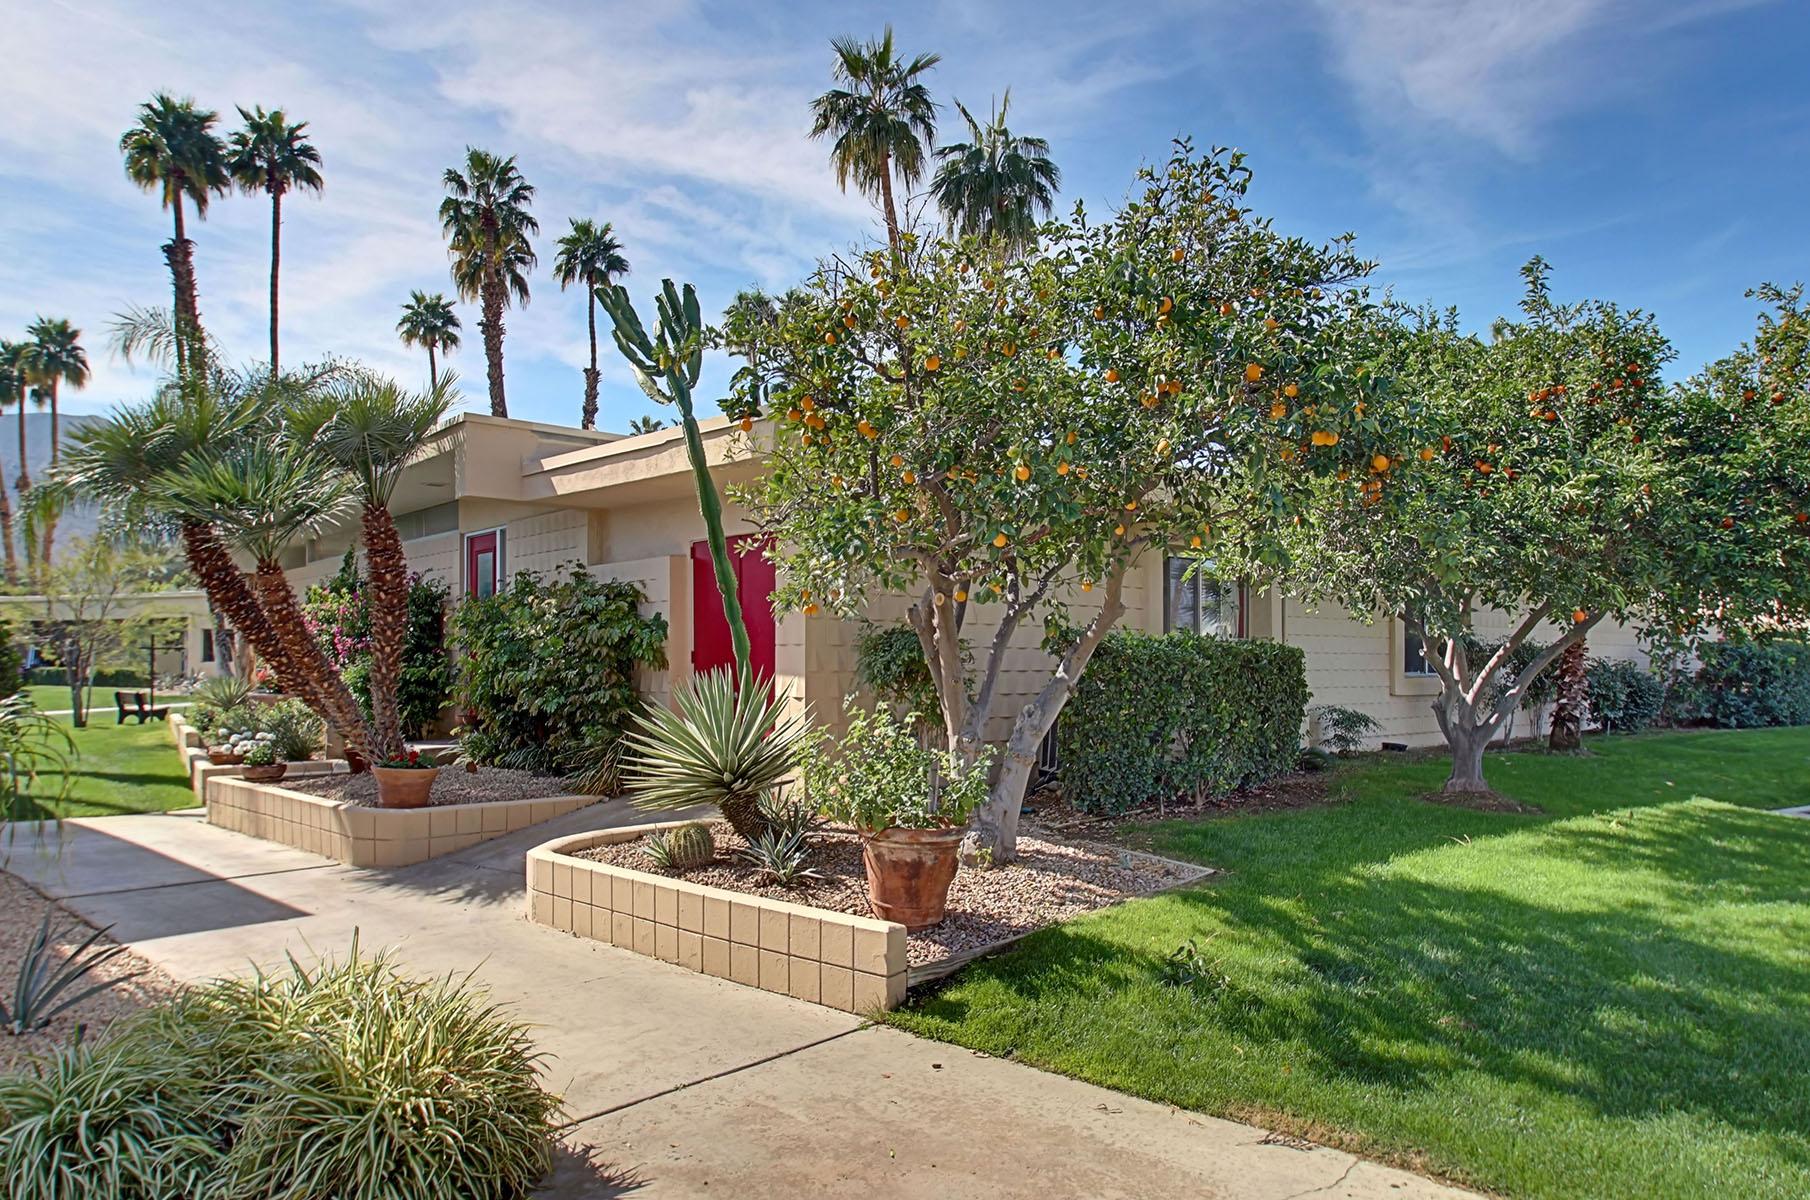 Condominium for Sale at 345 Westlake Terrace Palm Springs, California 92264 United States